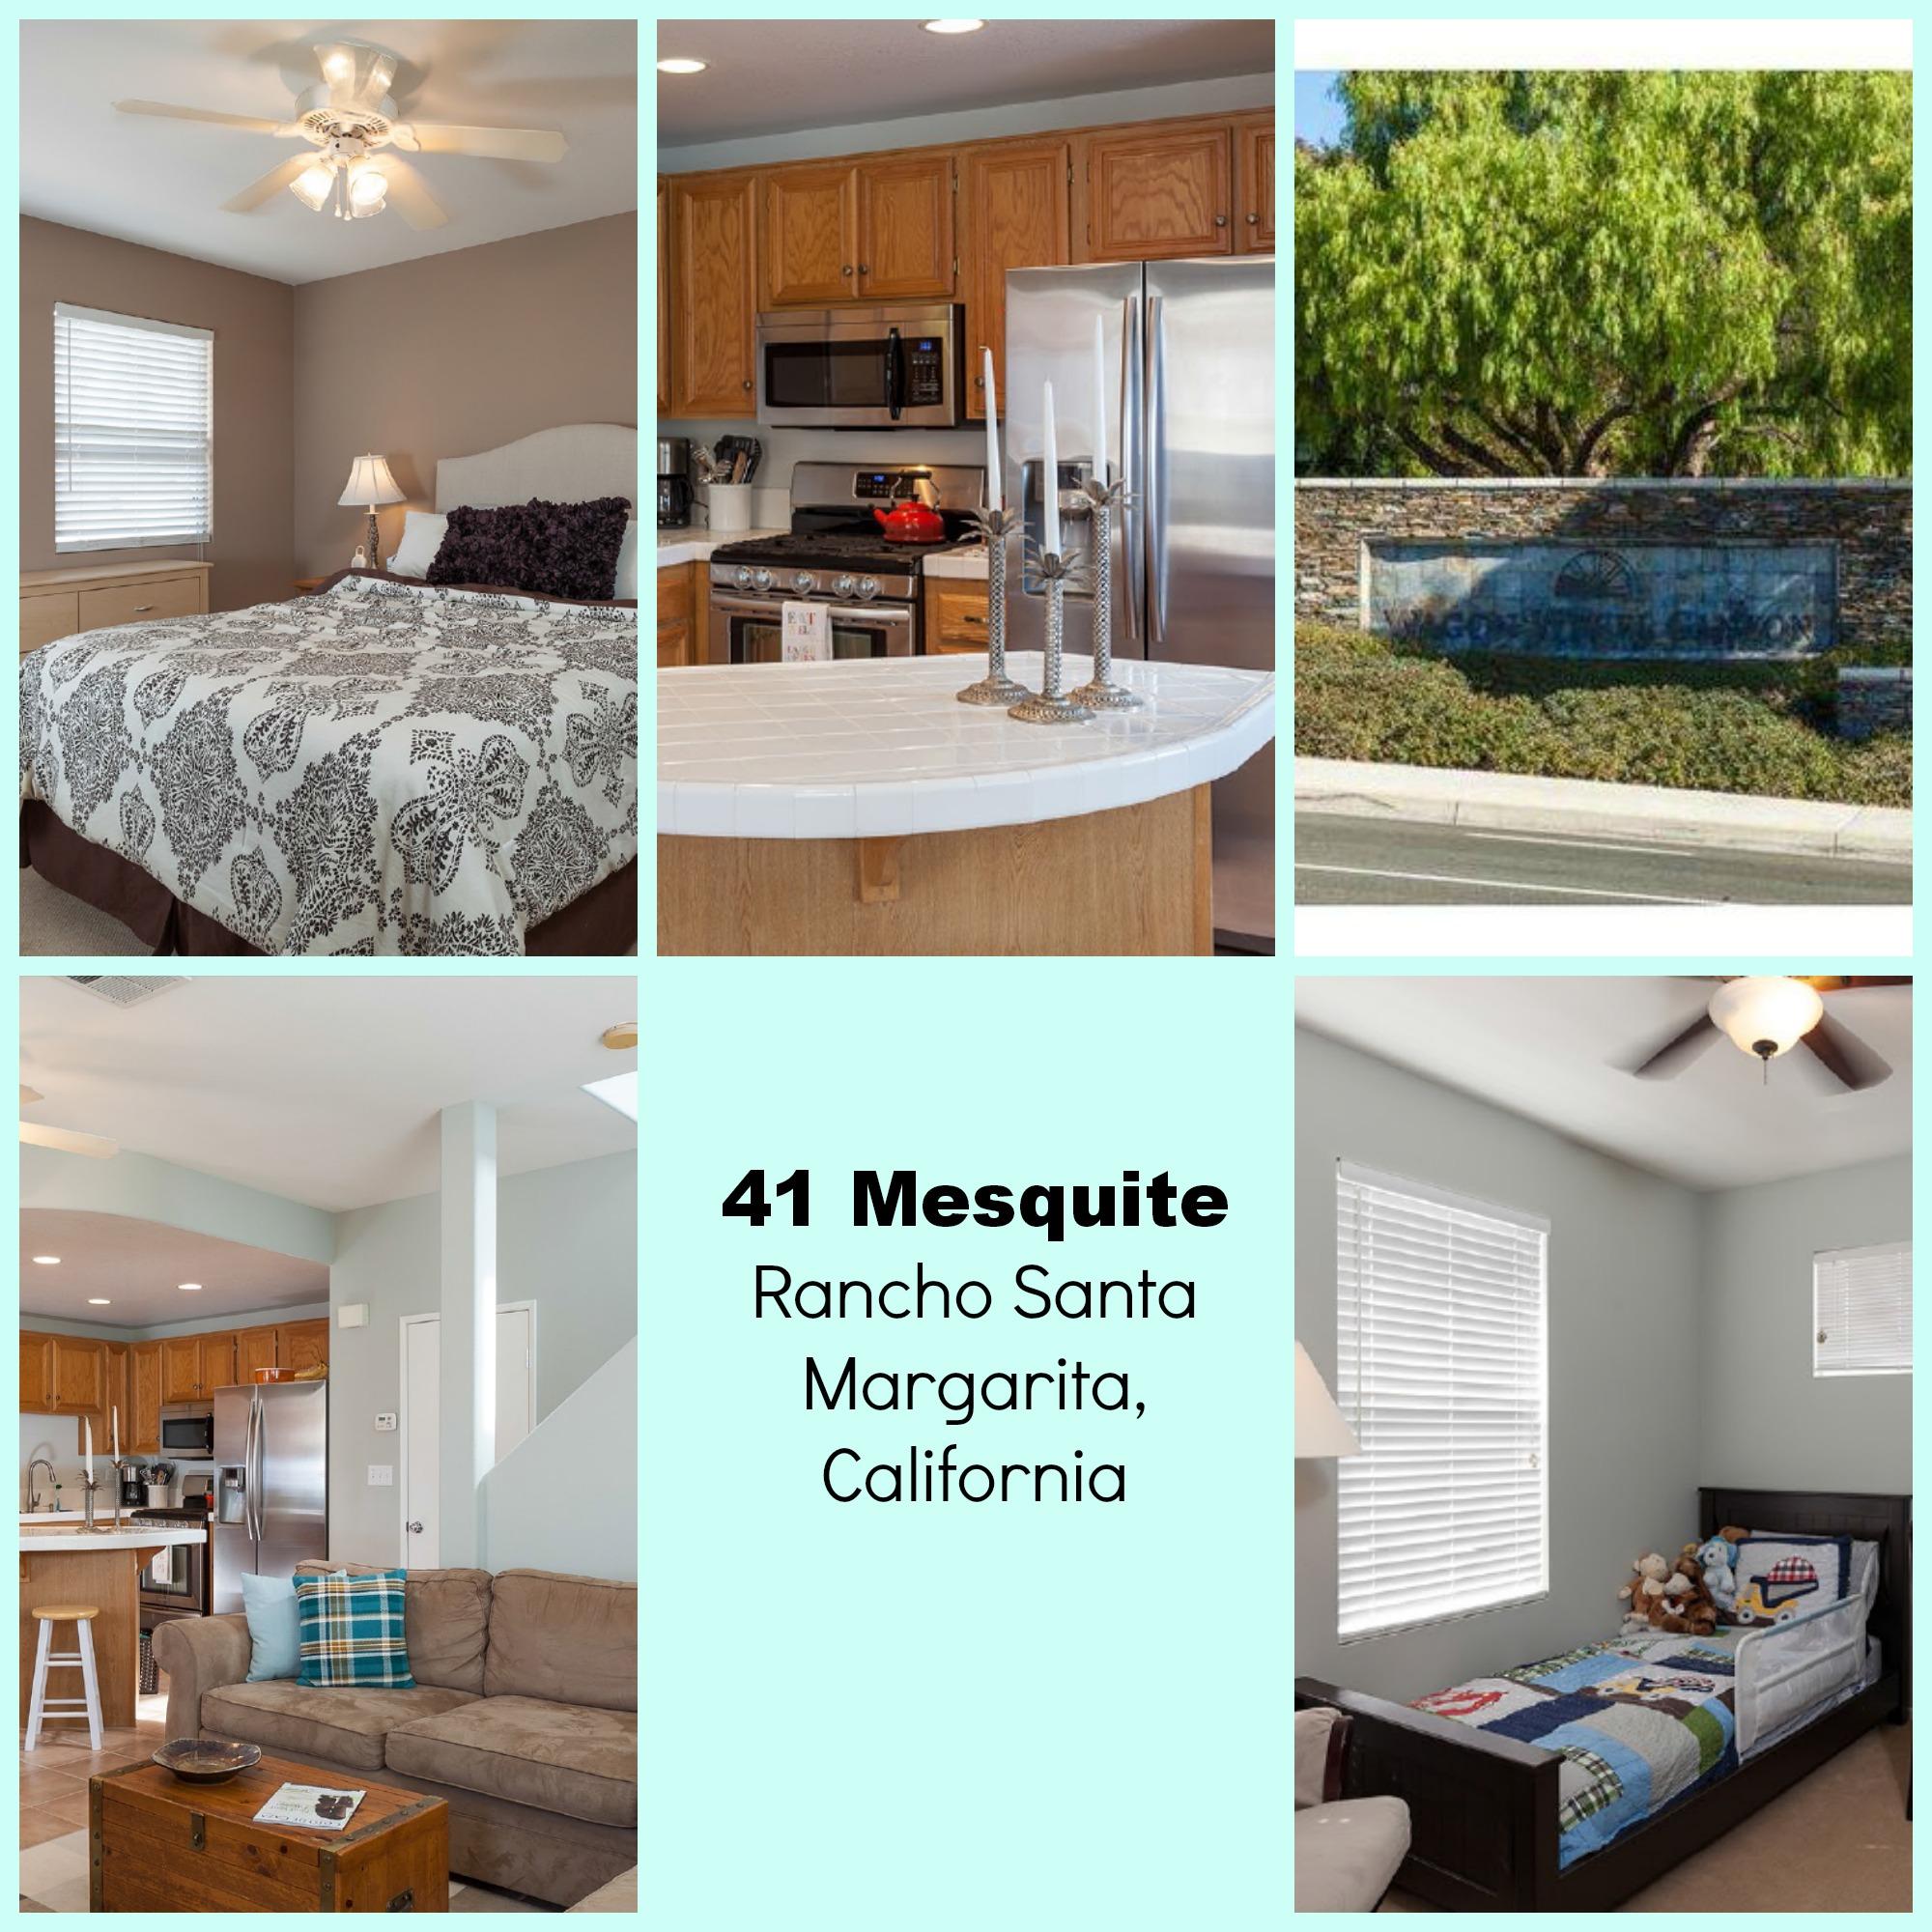 41 Mesquite Rancho Santa Margarita California